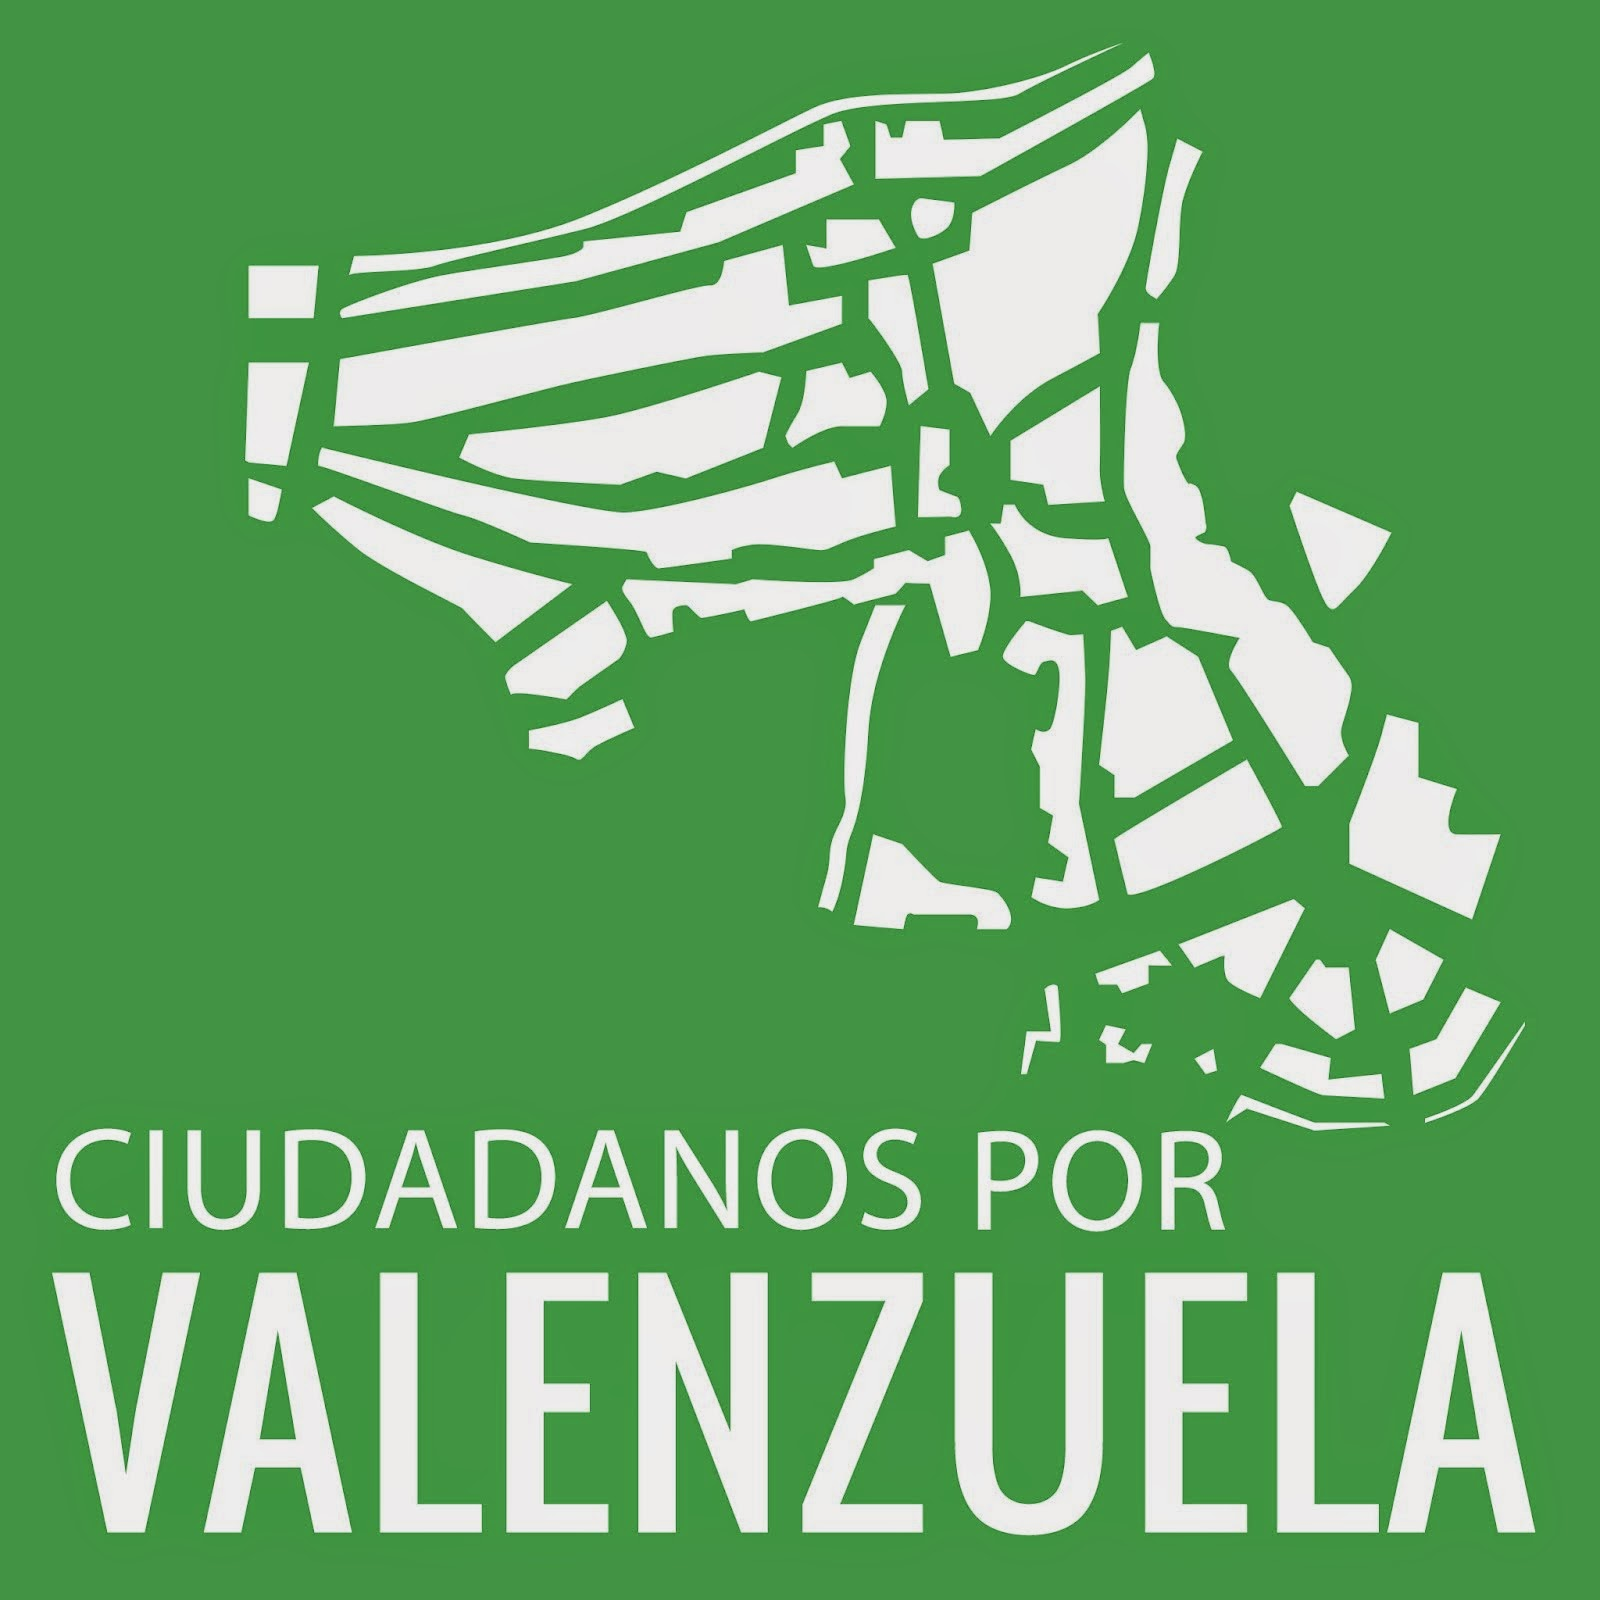 Ciudadanos por Valenzuela